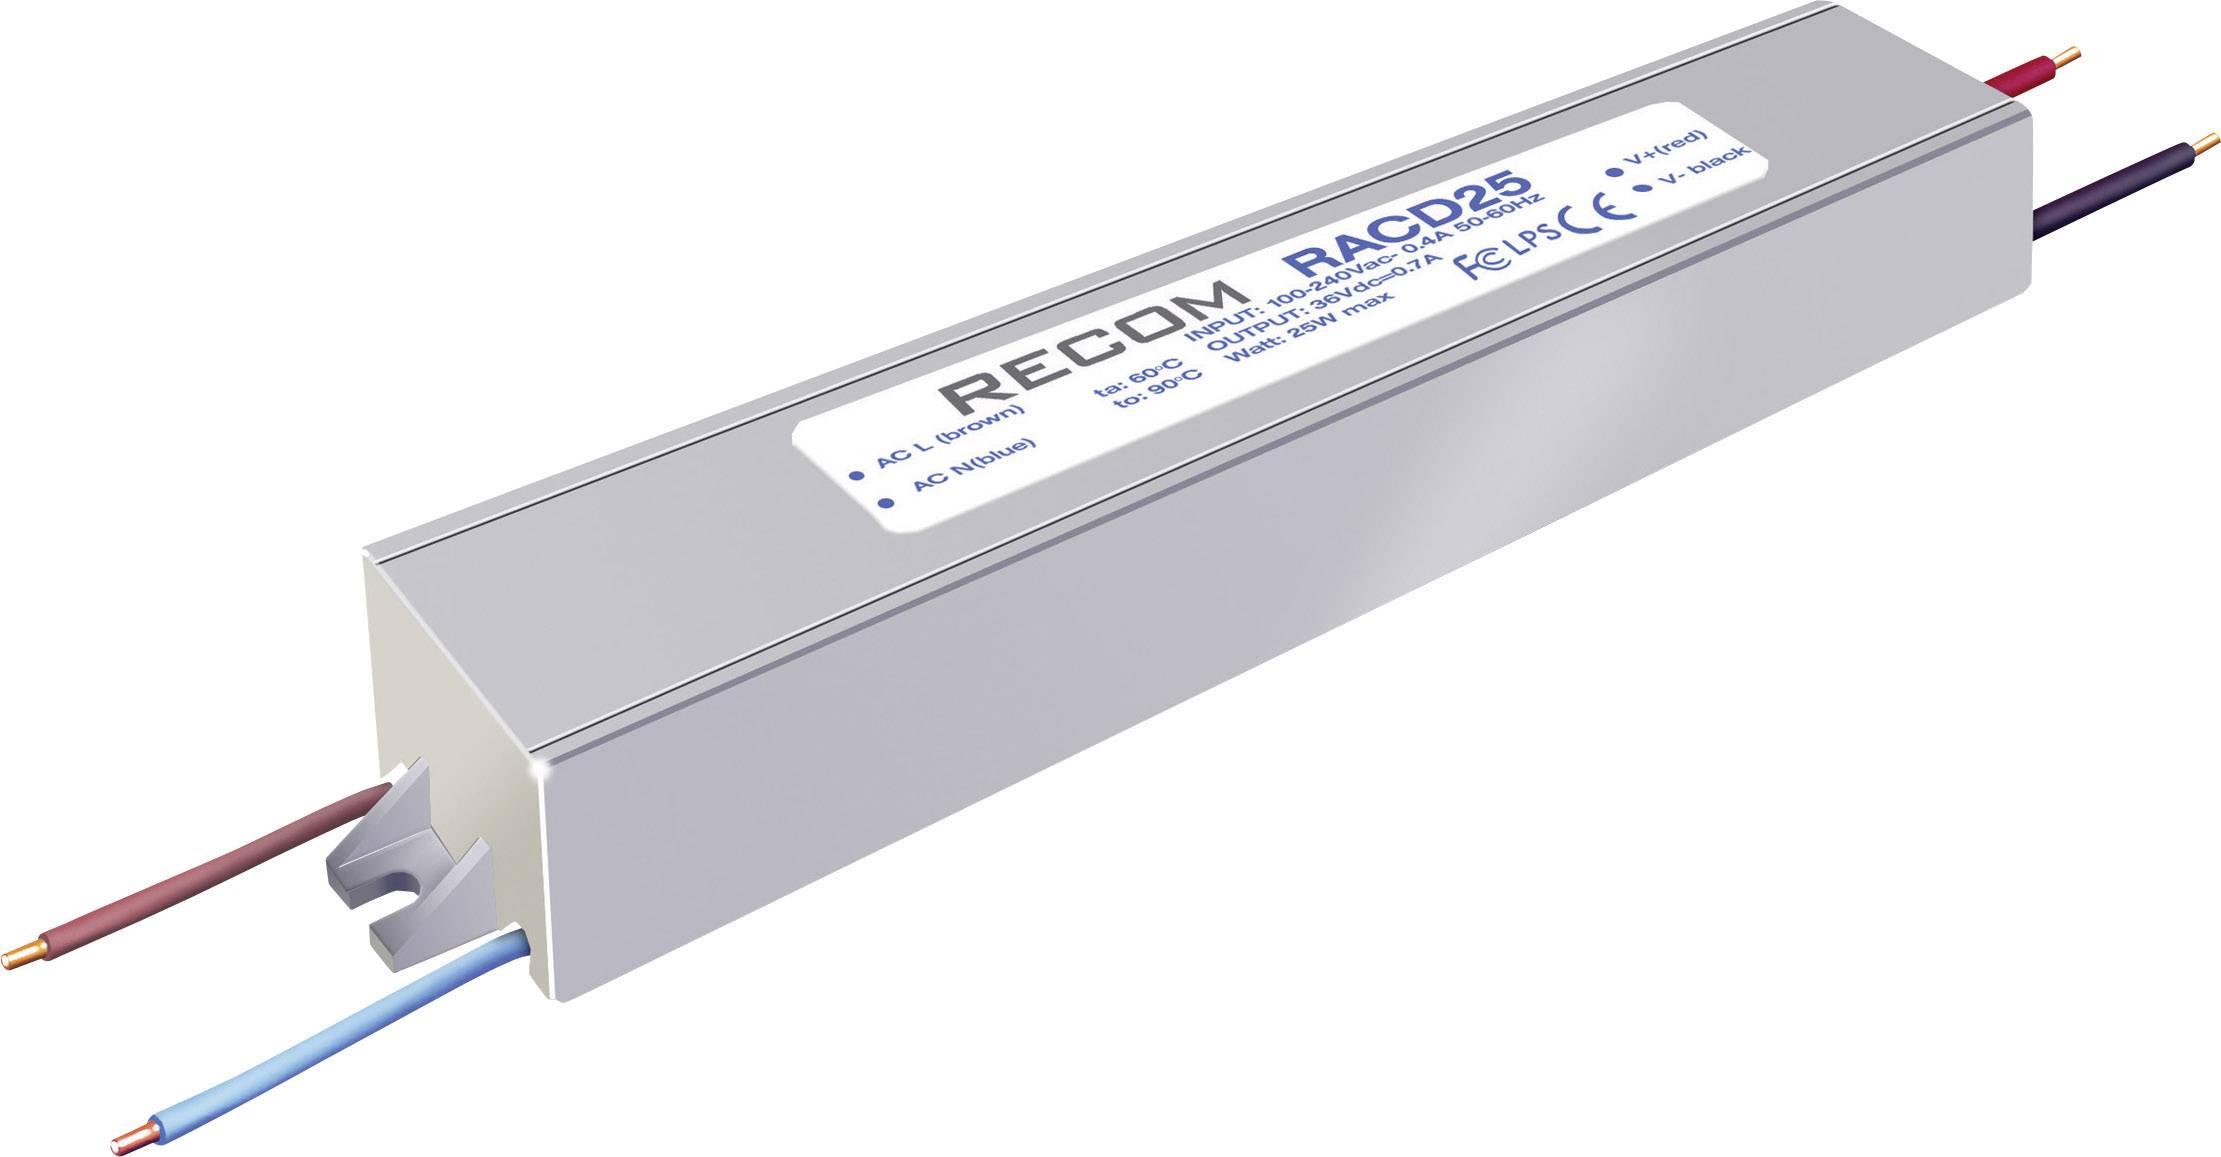 LED driver Recom Lighting RACD25-700P, 25 W (max), 0.7 A, 21 - 36 V/DC